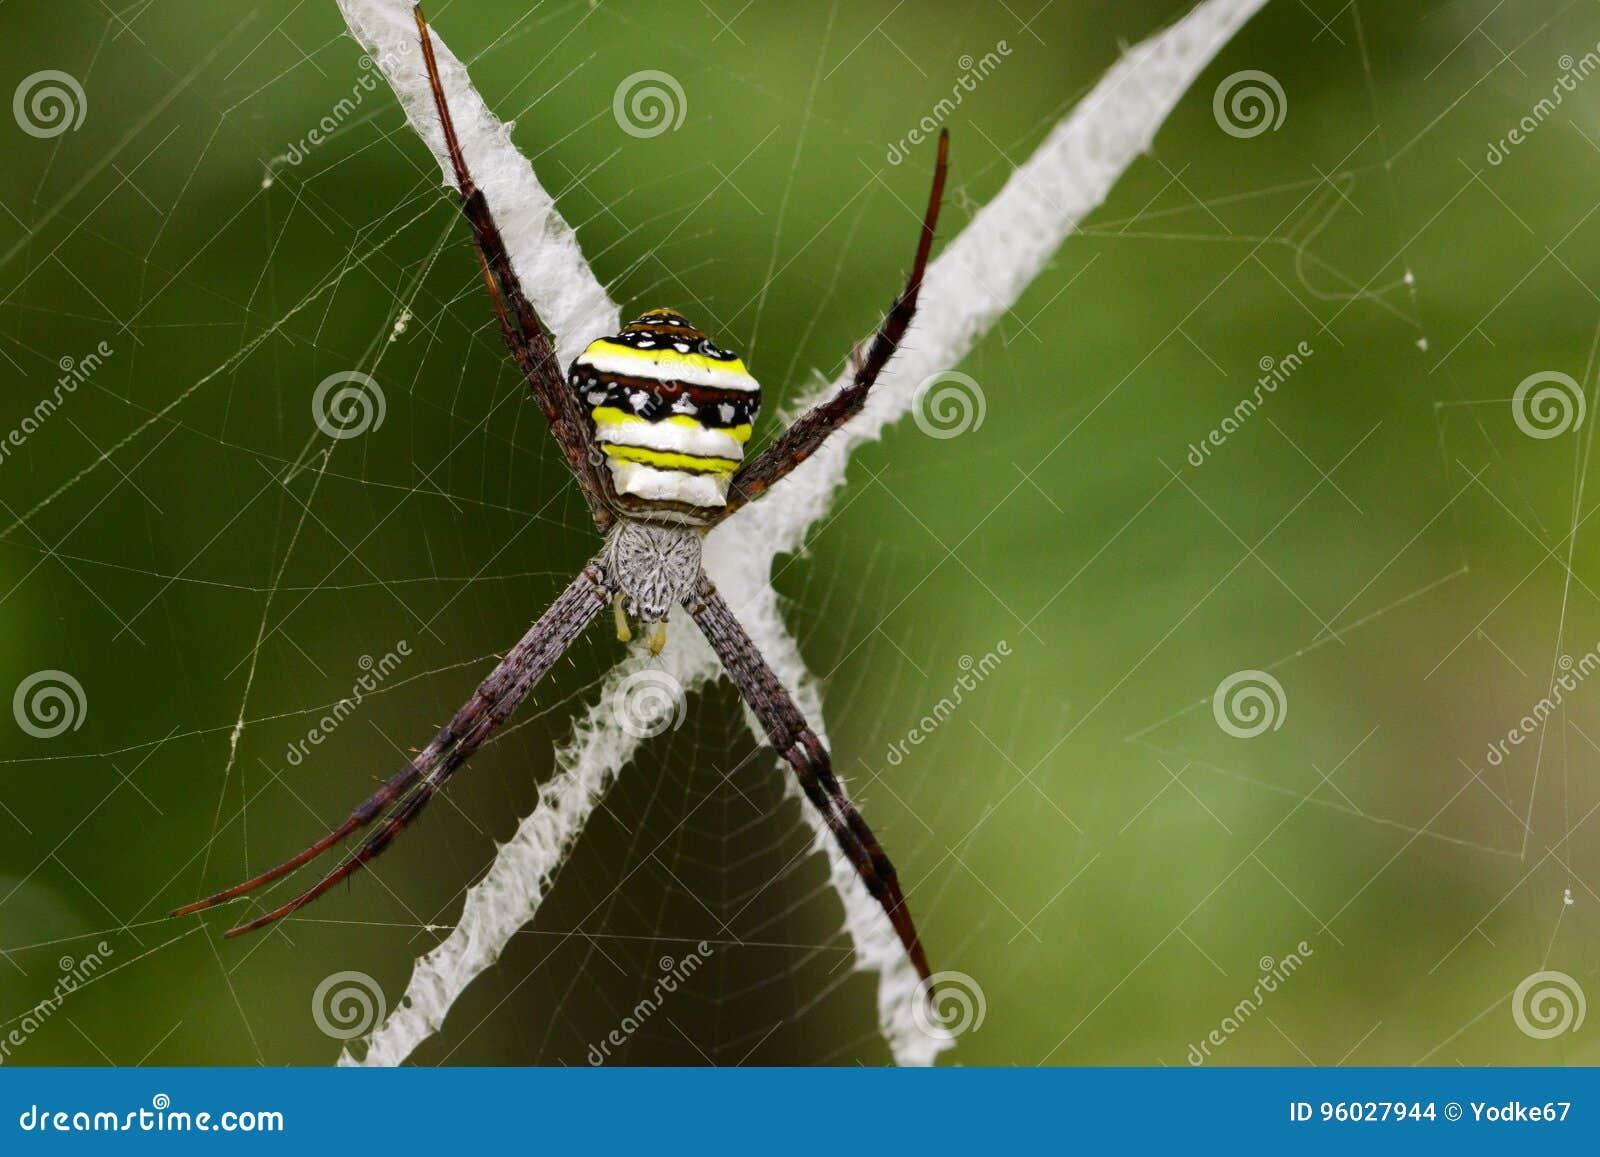 Wizerunek coloured argiope pająk